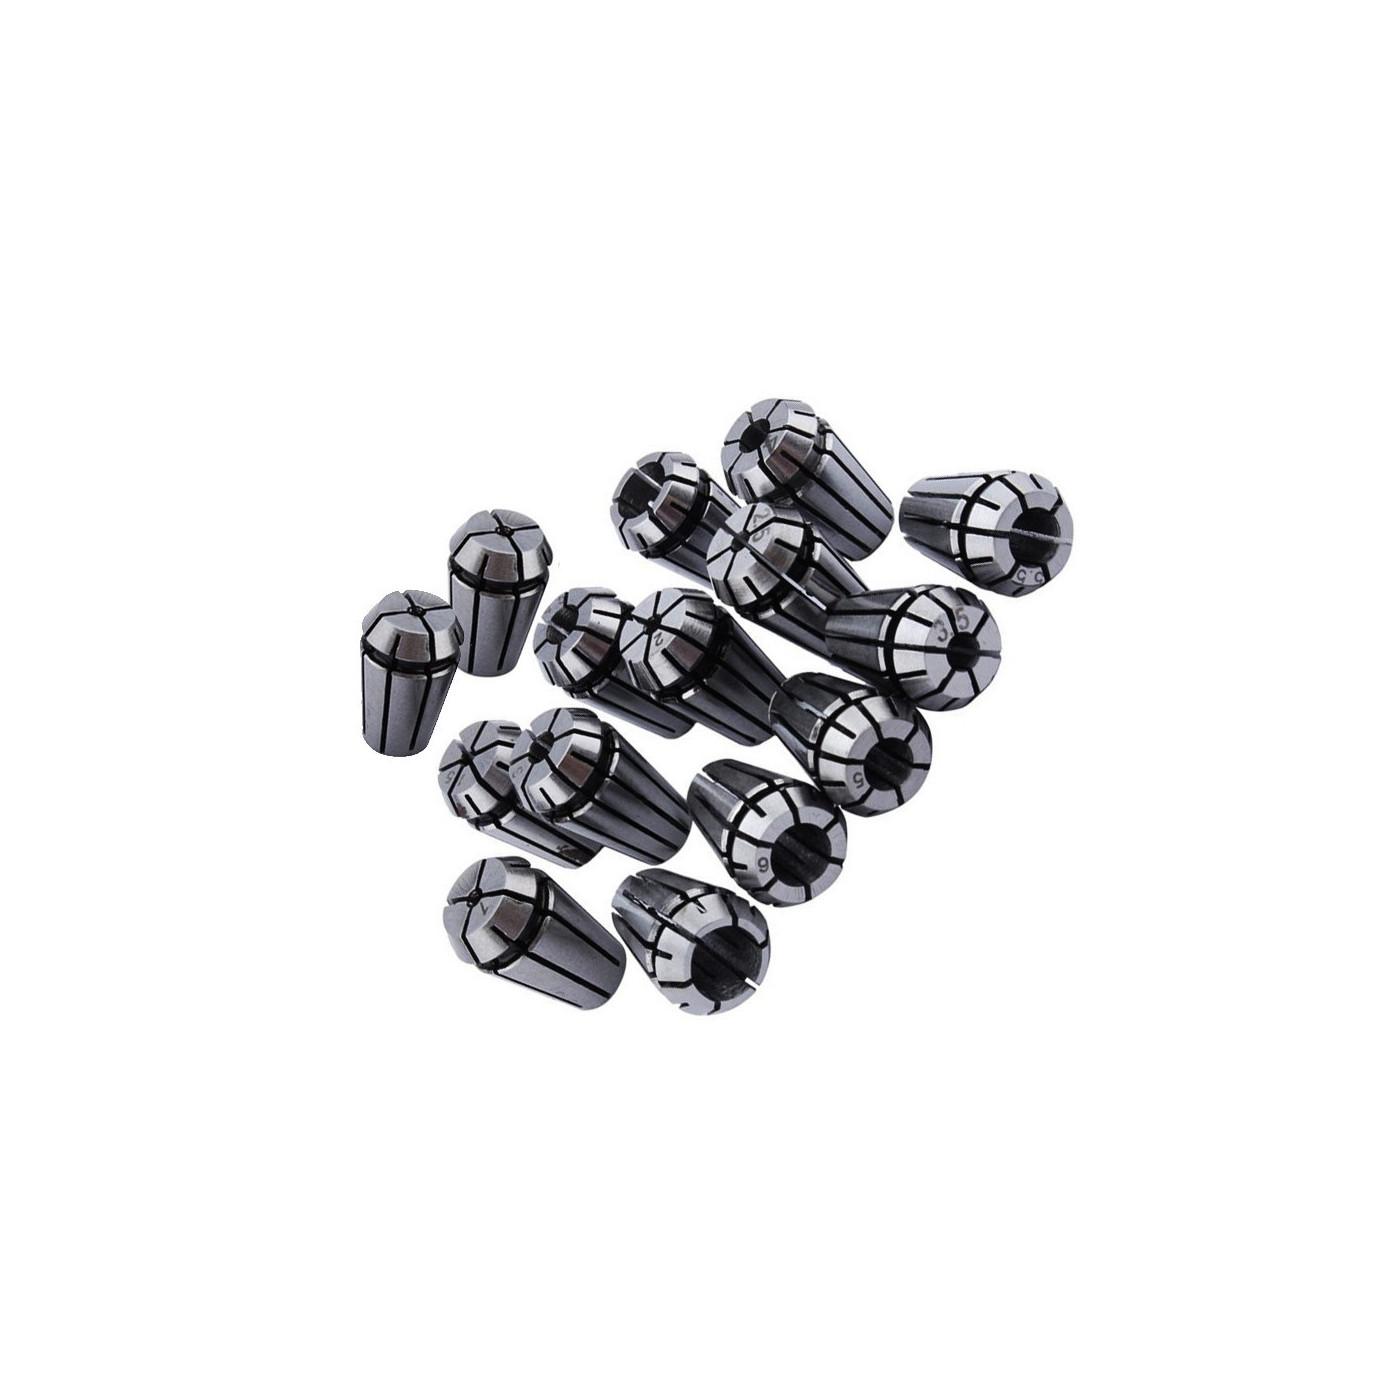 Set mandrini ER11 (15 pezzi, 1-7 mm, compresi 1/8 inch, 1/4